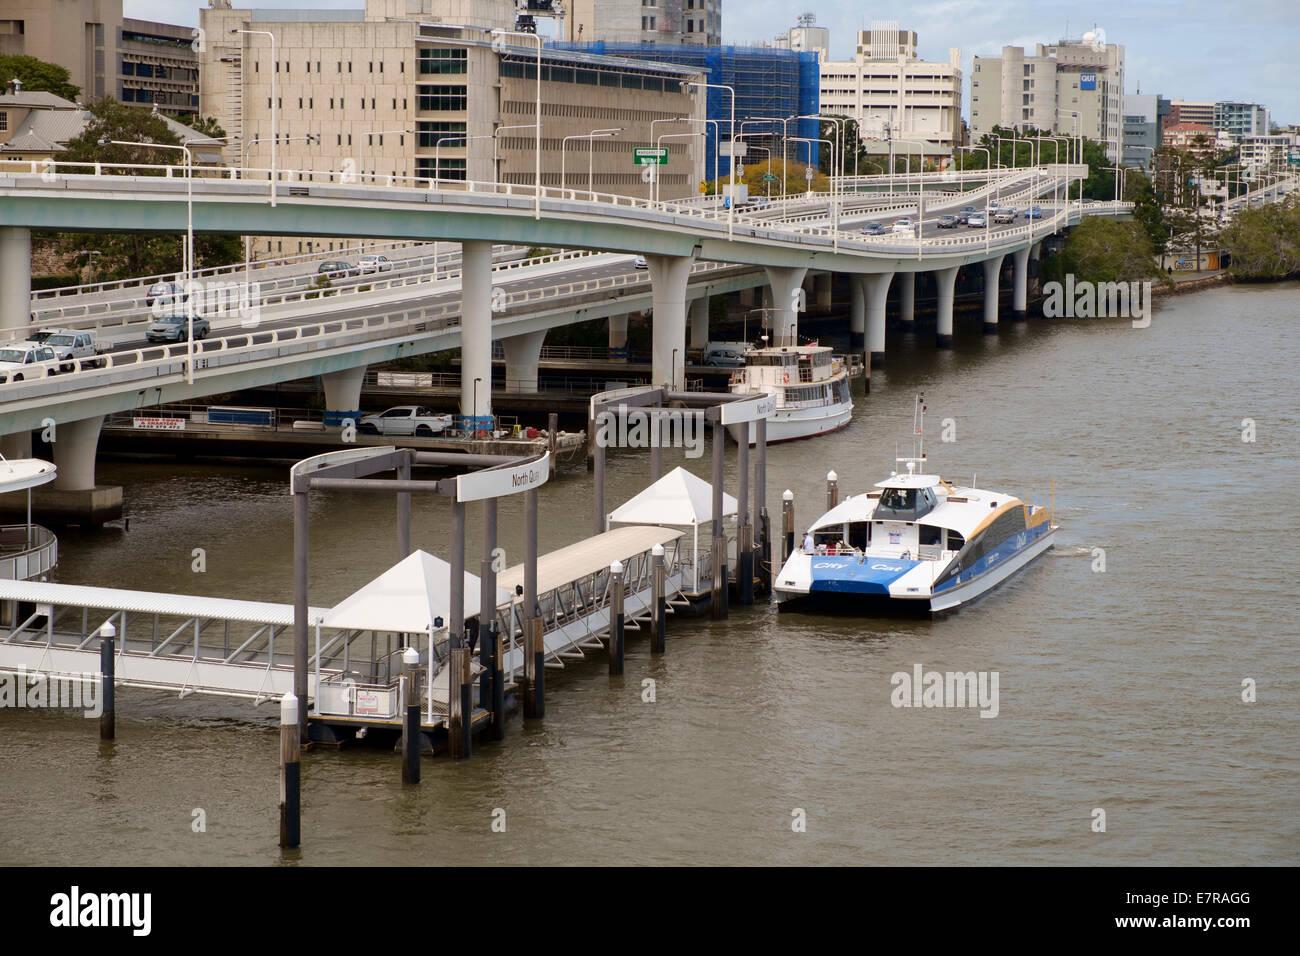 Brisbane Citycat on the Brisbane River - Stock Image